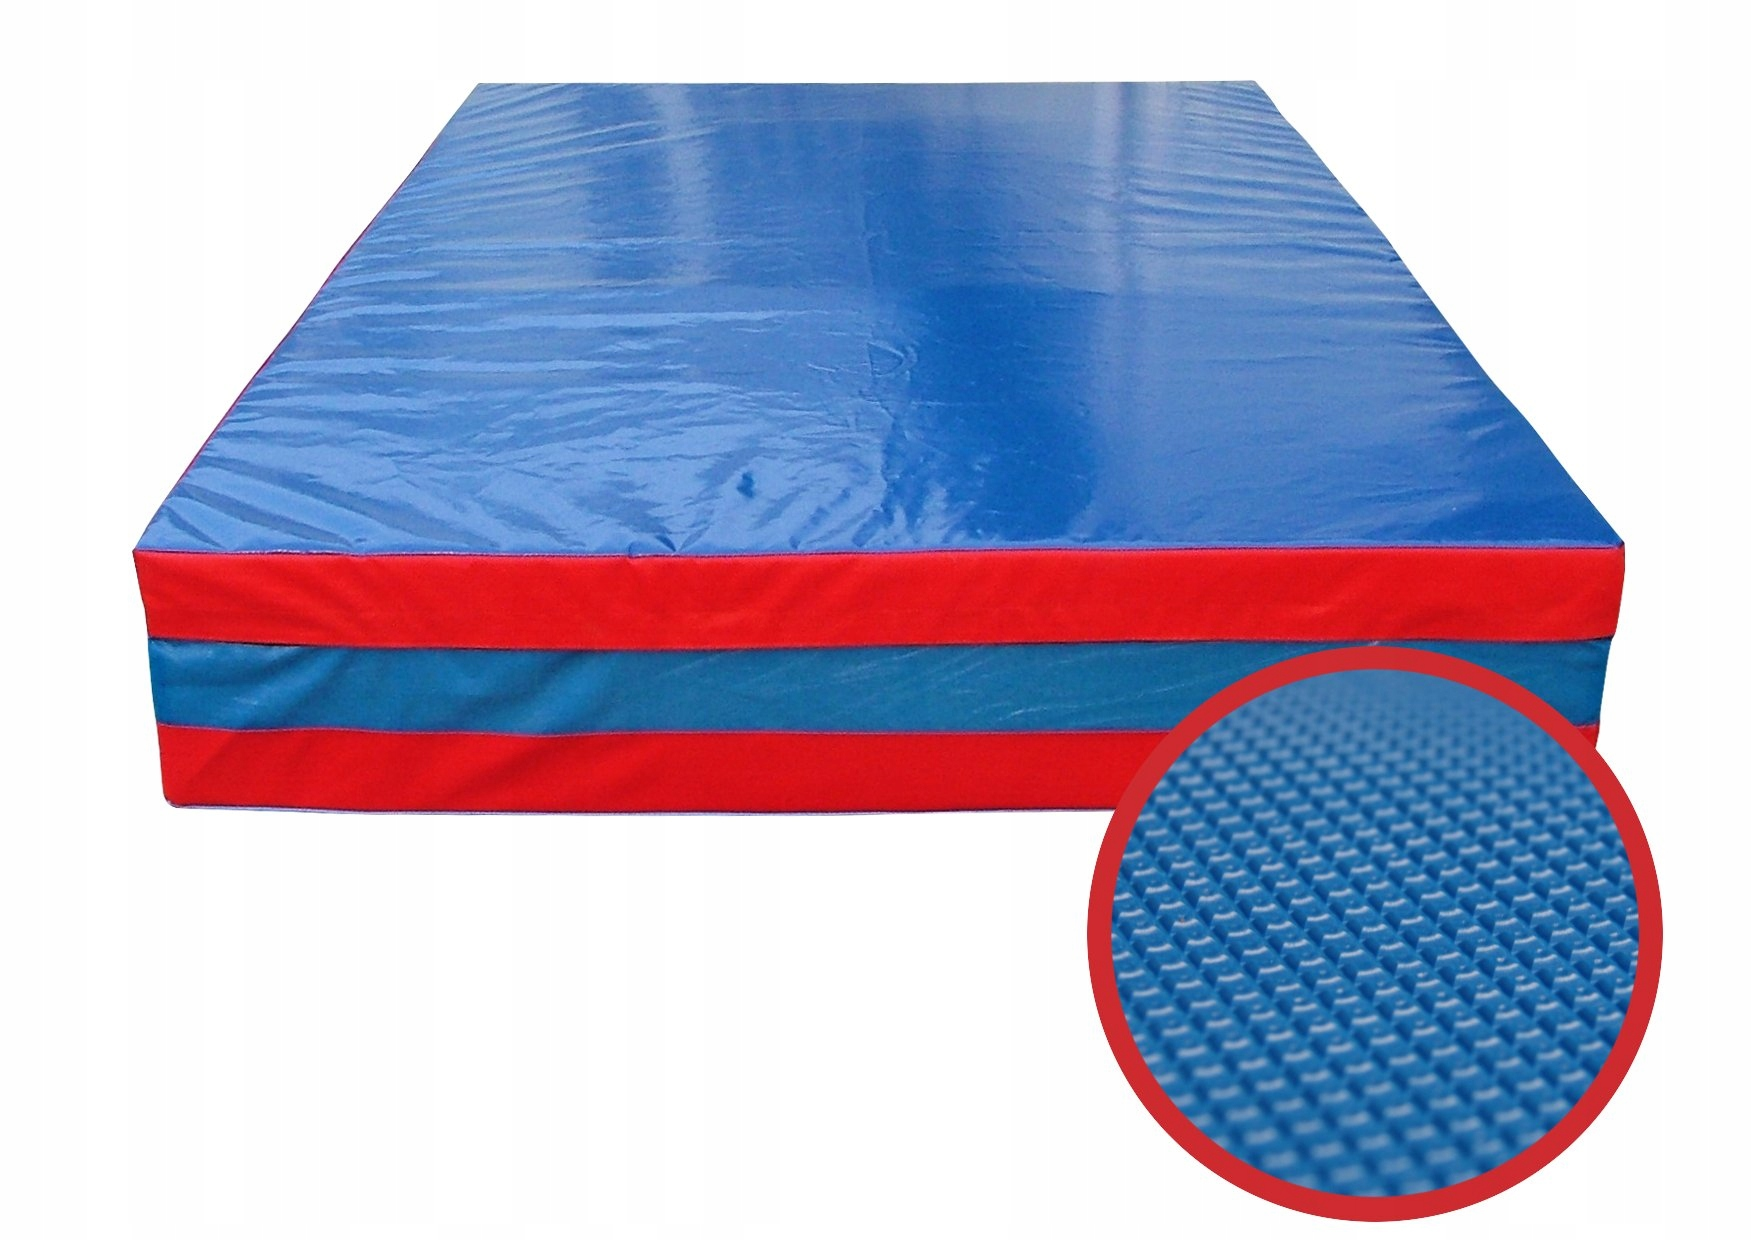 Nosný gymnastický matrac 300x200x40